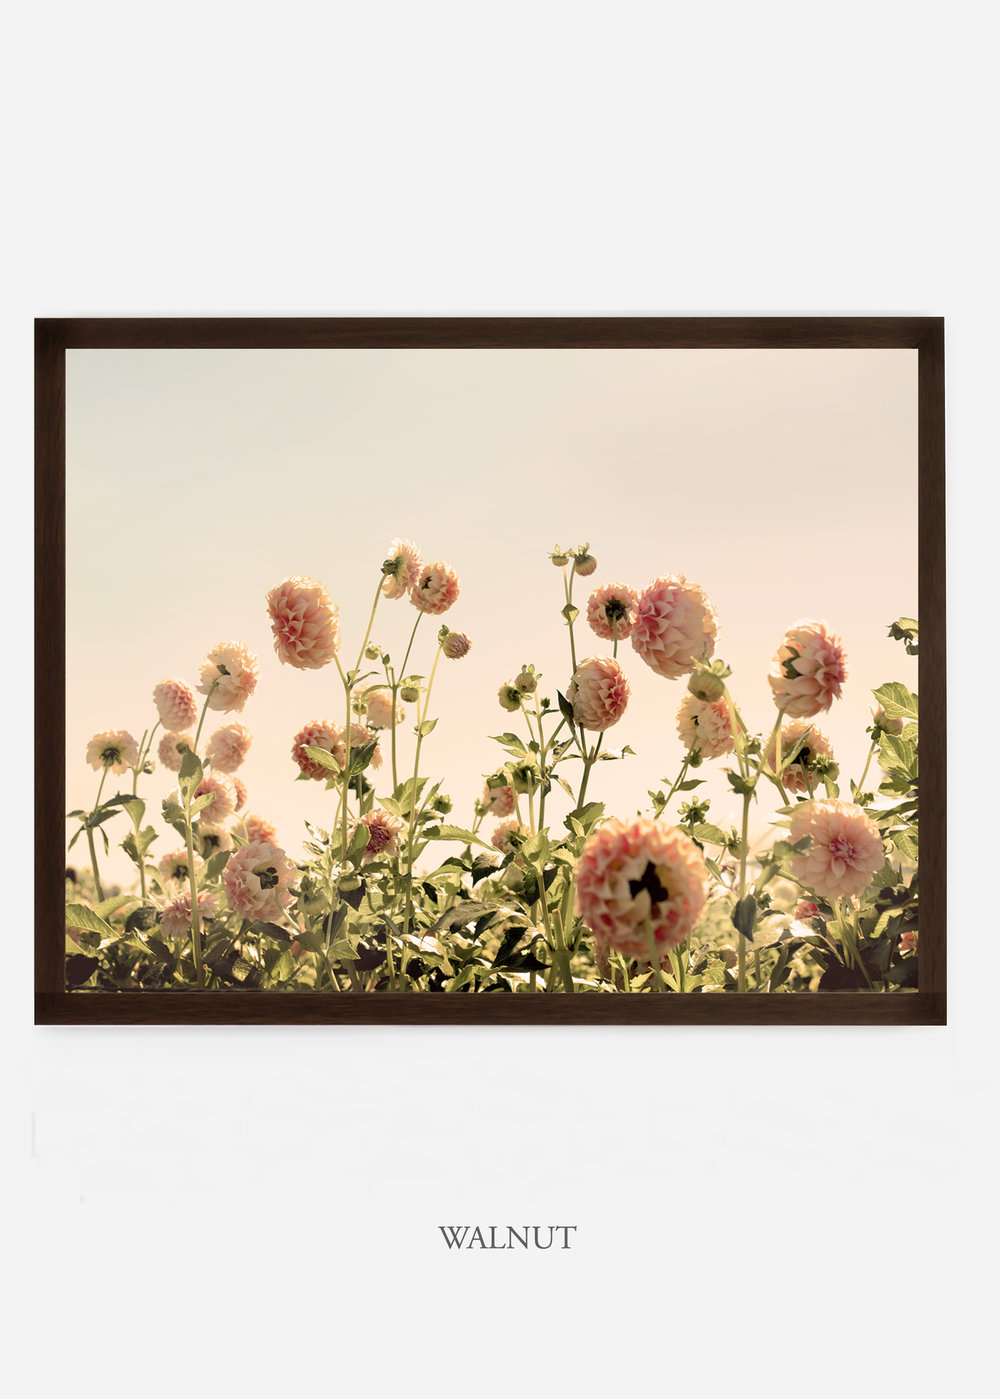 NoMat_WalnutFrame_DahliaNo.1_WilderCalifornia_Art_Floral_Homedecor_Prints_Dahlia_Botanical_Artwork_Interiordesign.jpg